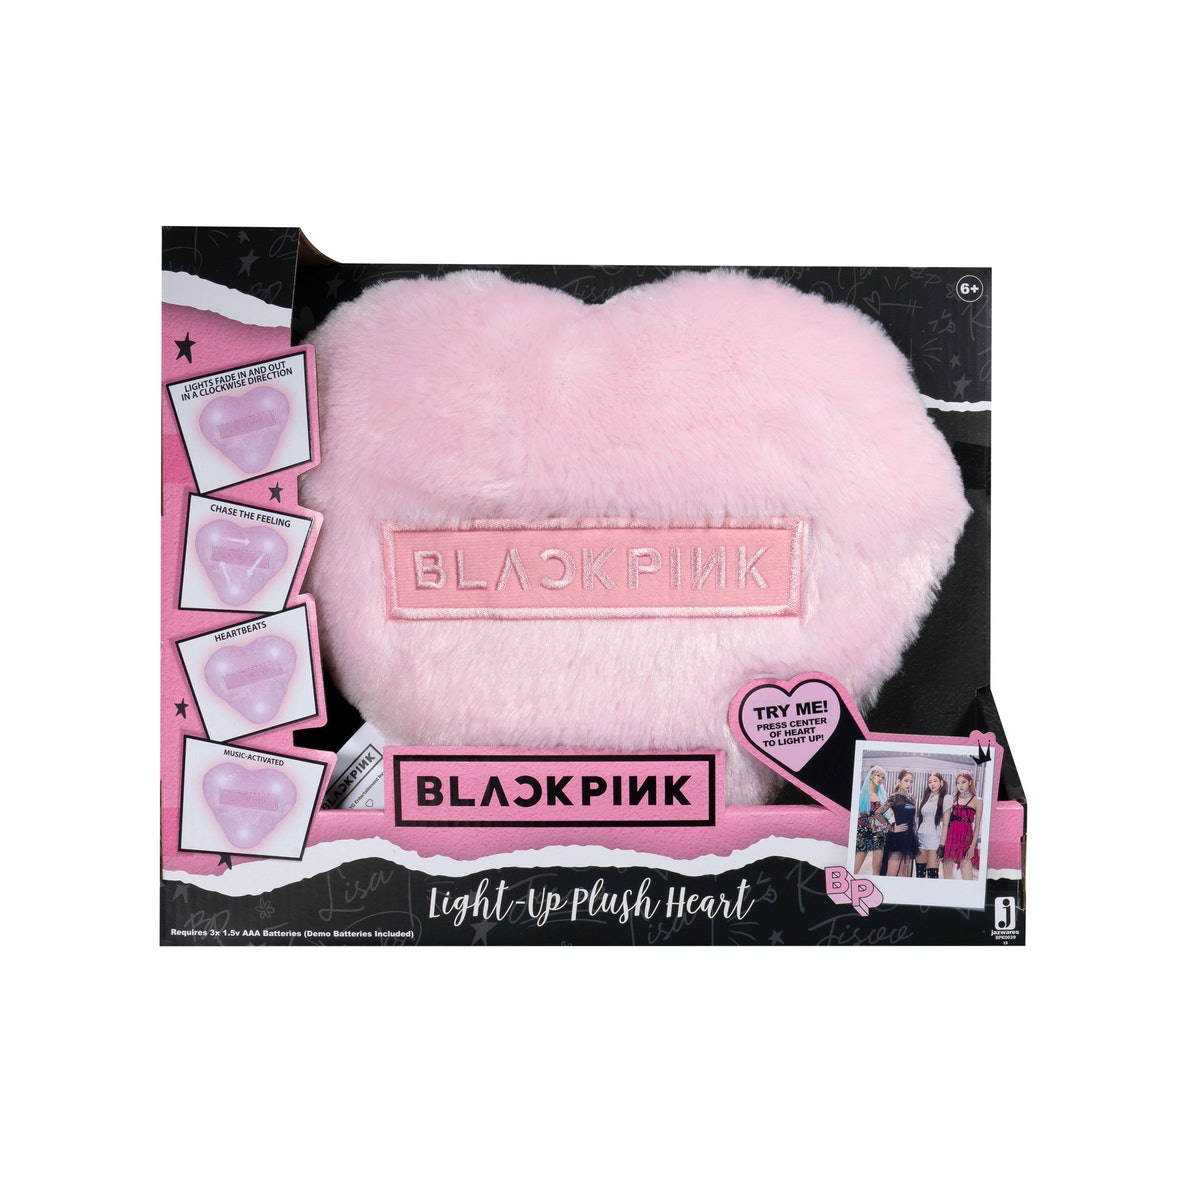 BLACKPINK Light-Up Plush Heart